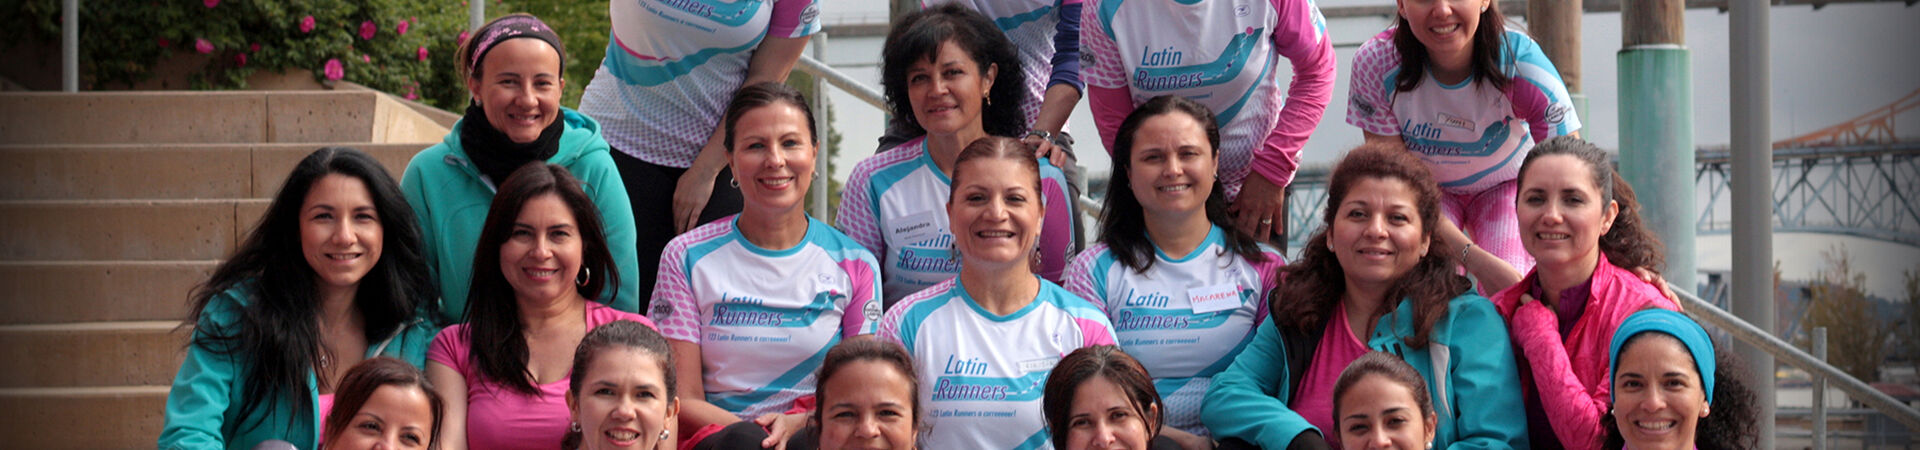 Banner - Bonding Active Communities Society (Latin Runners)